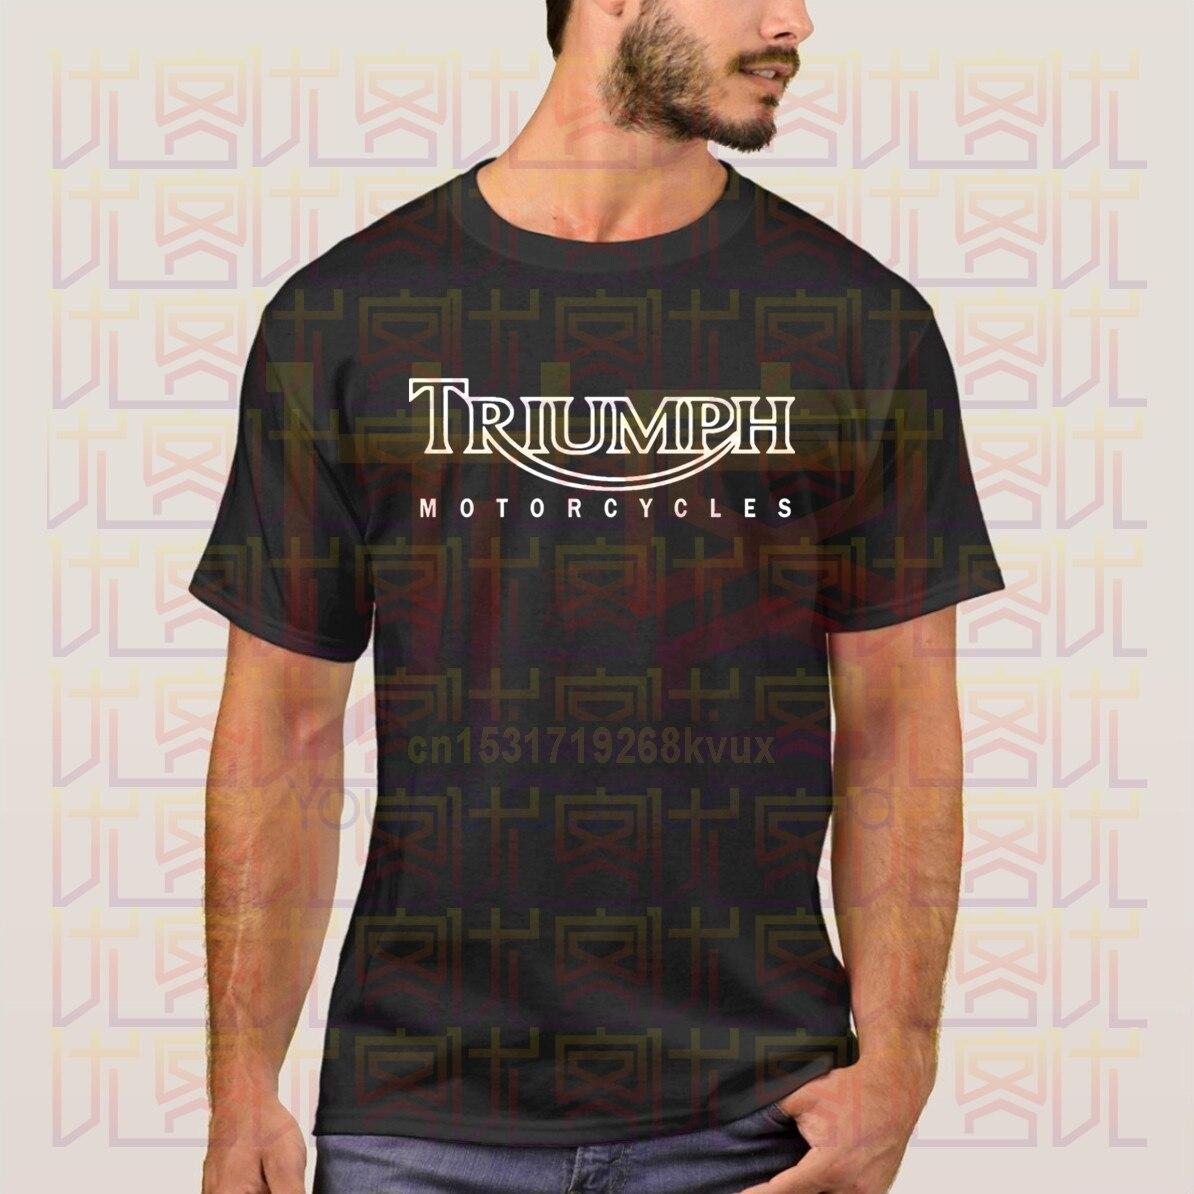 Free Shipping Triumph Motorcycles T-Shirt Blouse Shirt Men's Top Tees New Brand Tshirt Men Summer Style Top Tees